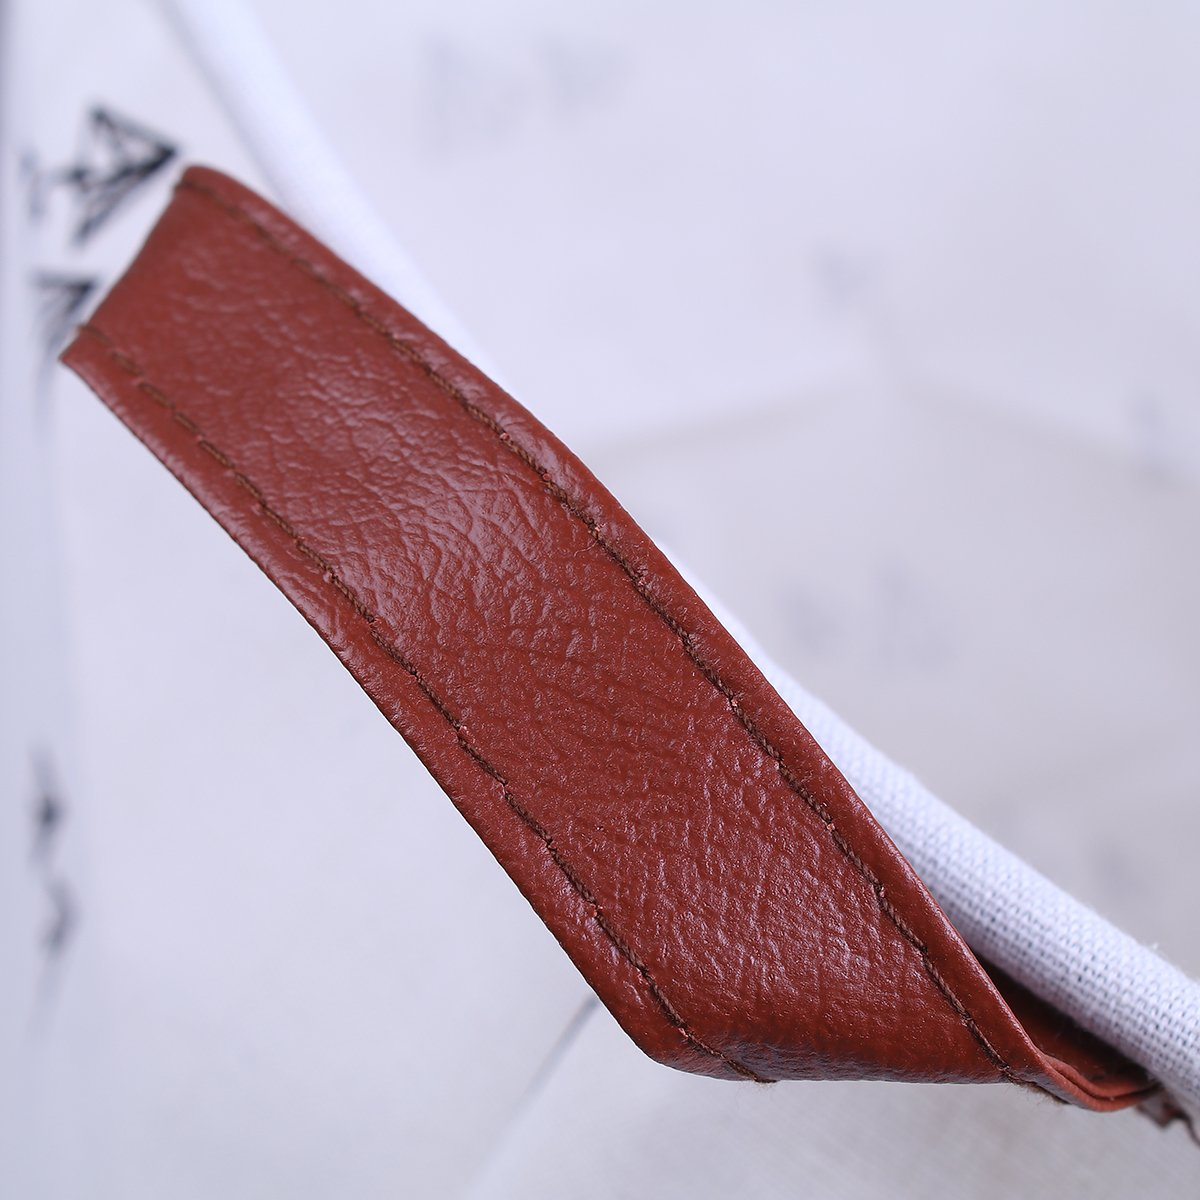 Fyore Faltbar Gro/ß W/äschekorb W/äschesack Canvas Leinen Original Leder Griff Dreieckig Design 62x50cm Blaue Bl/öcke